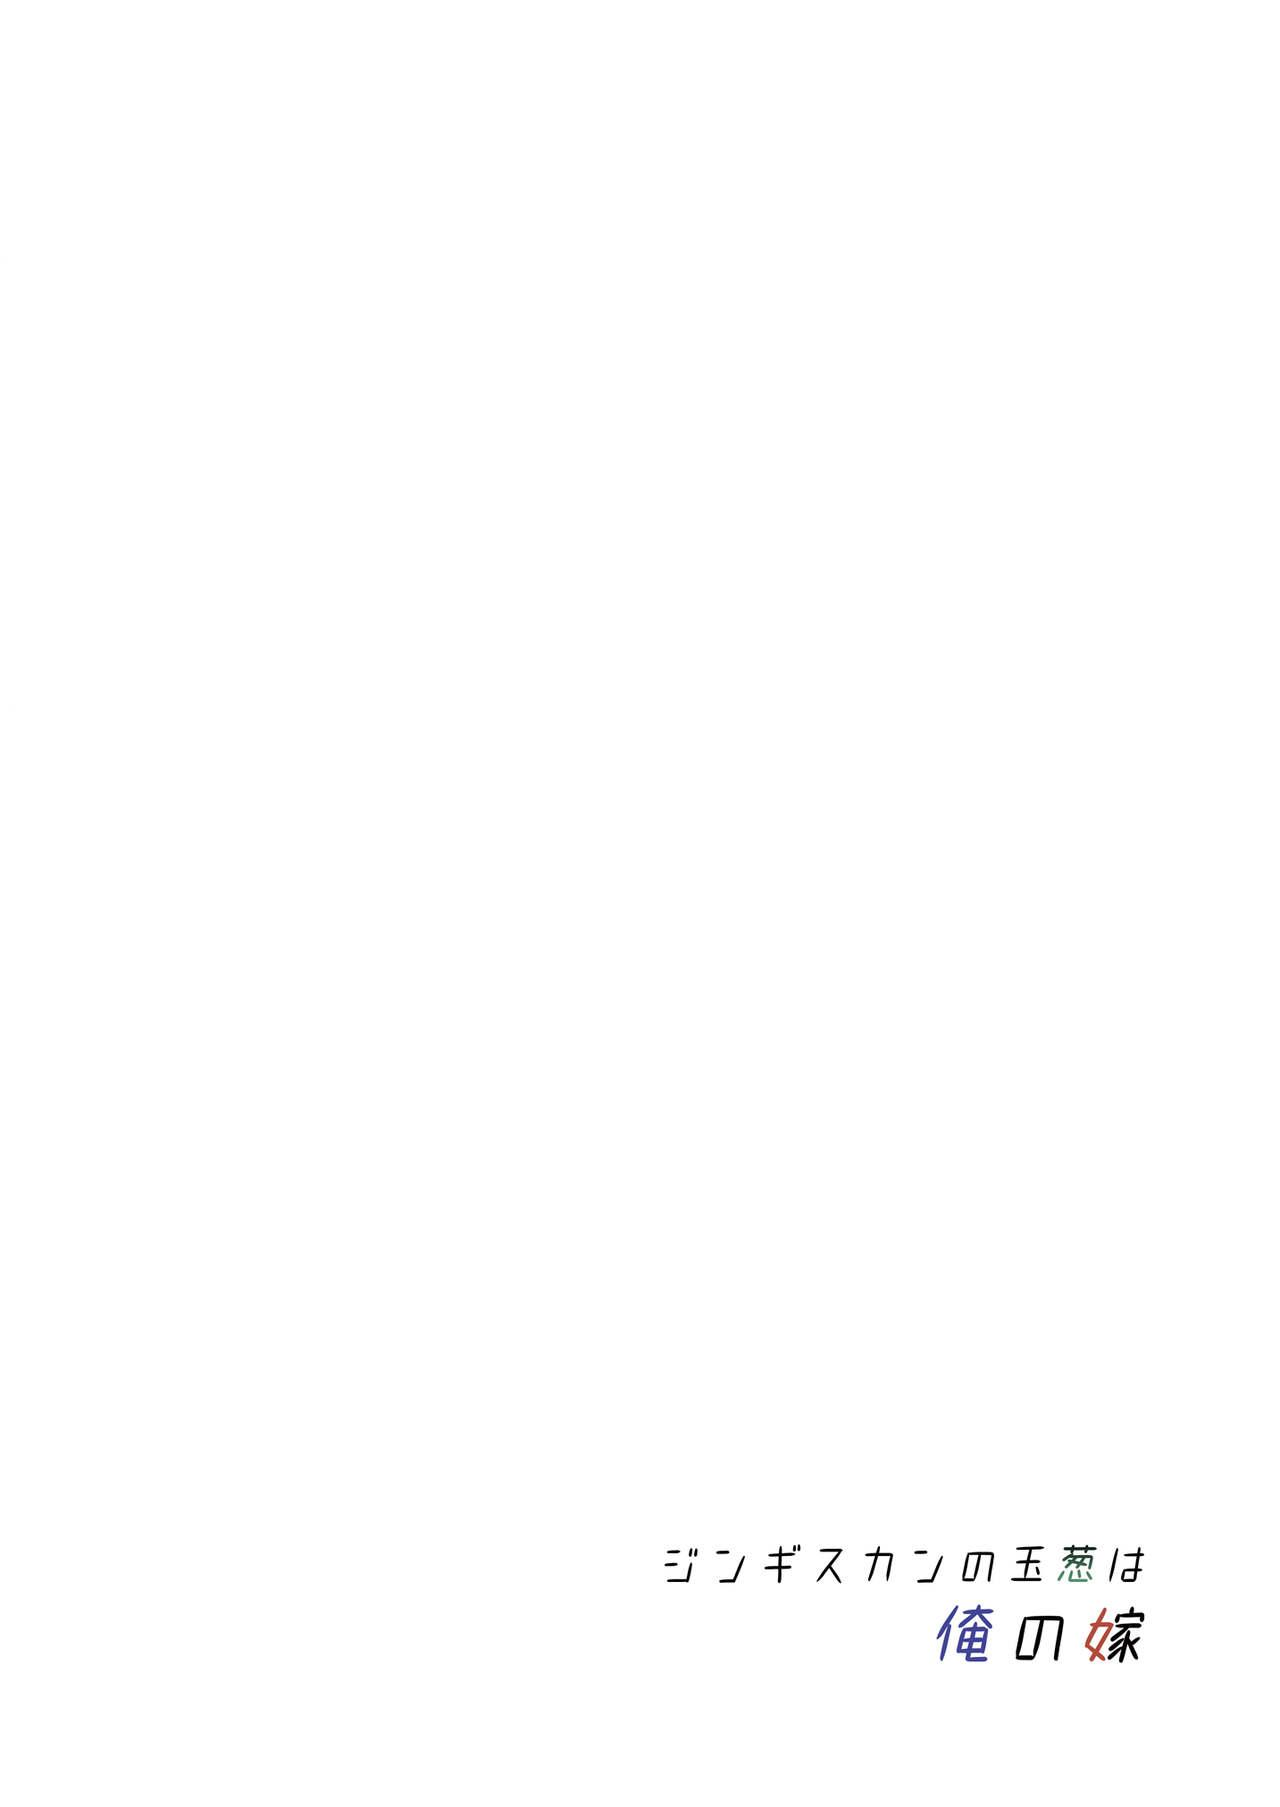 [Dschinghis Khan no Tamanegi wa Ore no Yome (Taniguchi-san)] Kimi -Jeanne d'Arc- ni Naru 2 (Fate/Grand Order) [Chinese] [熊崎玉子汉化组] [Digital] 25